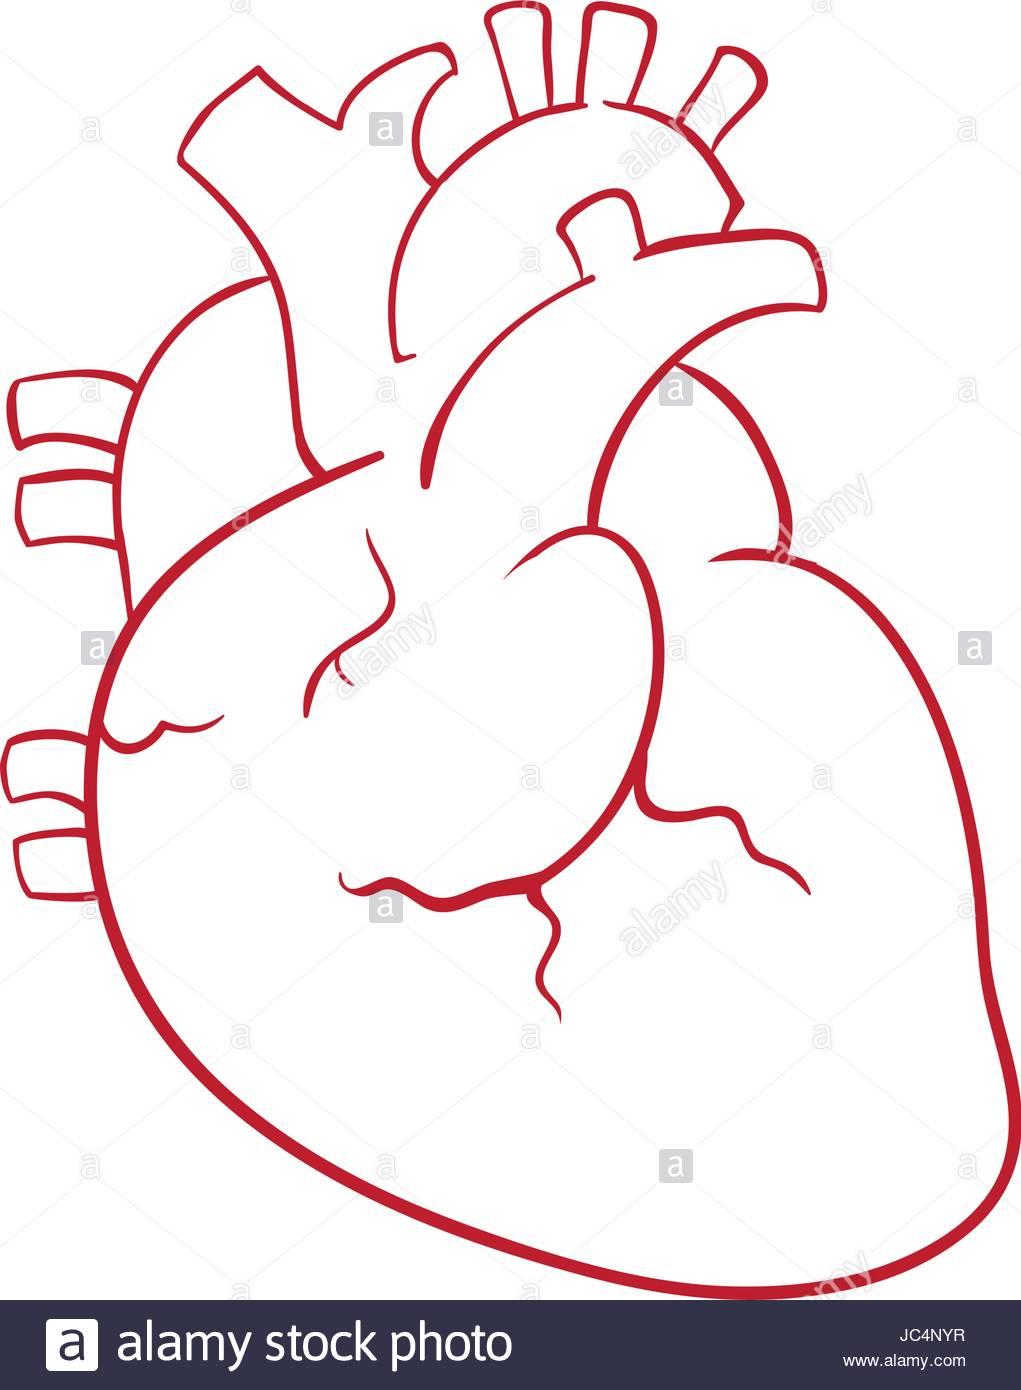 1021x1390 Human Heart Draw Stock Vector Art Amp Illustration, Vector Image